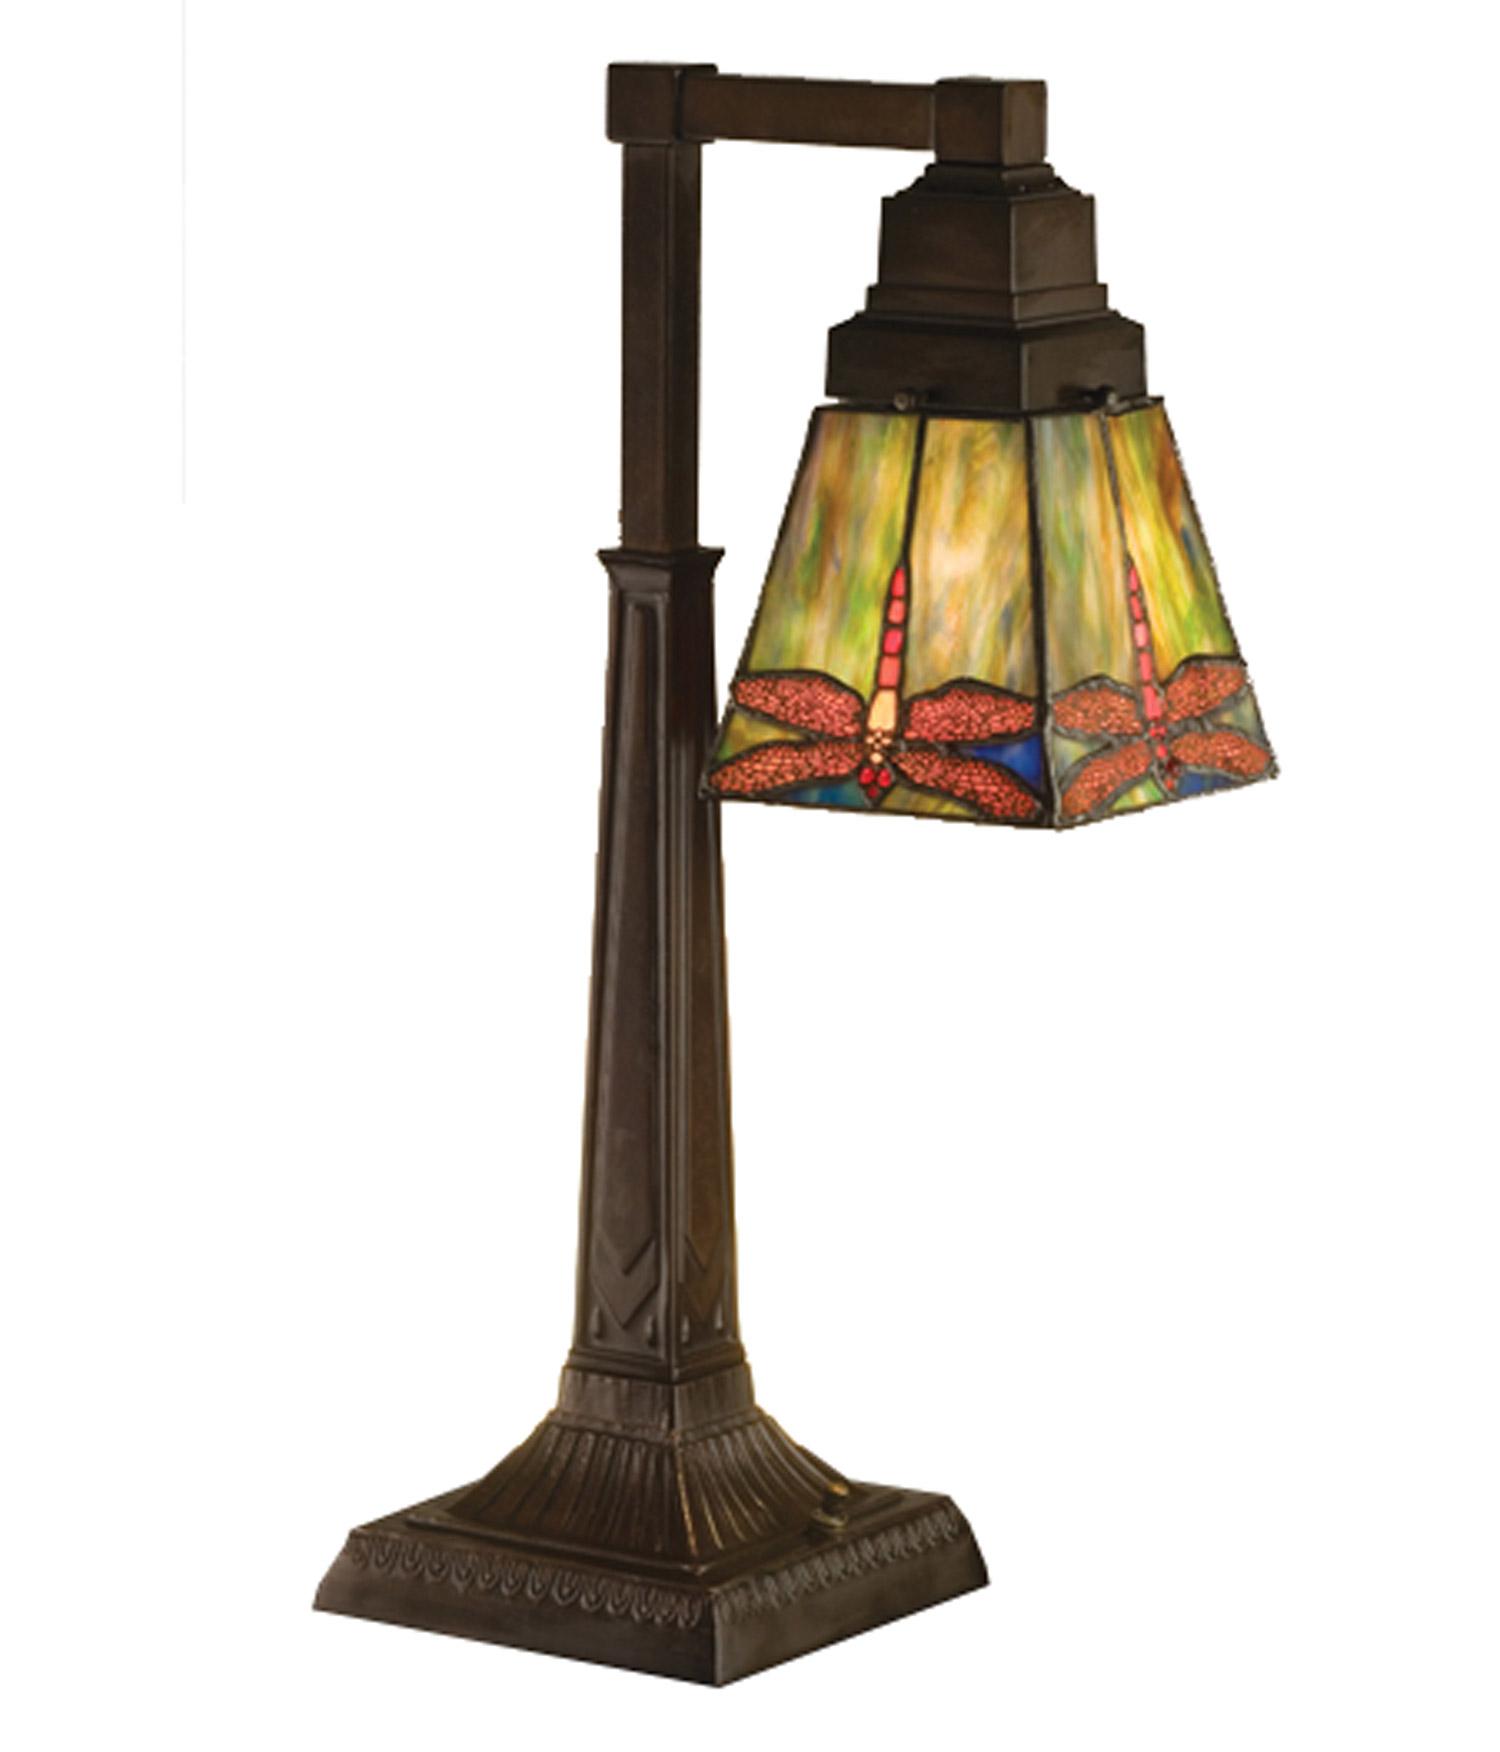 home lamps table lamps desk lamps meyda 48212. Black Bedroom Furniture Sets. Home Design Ideas